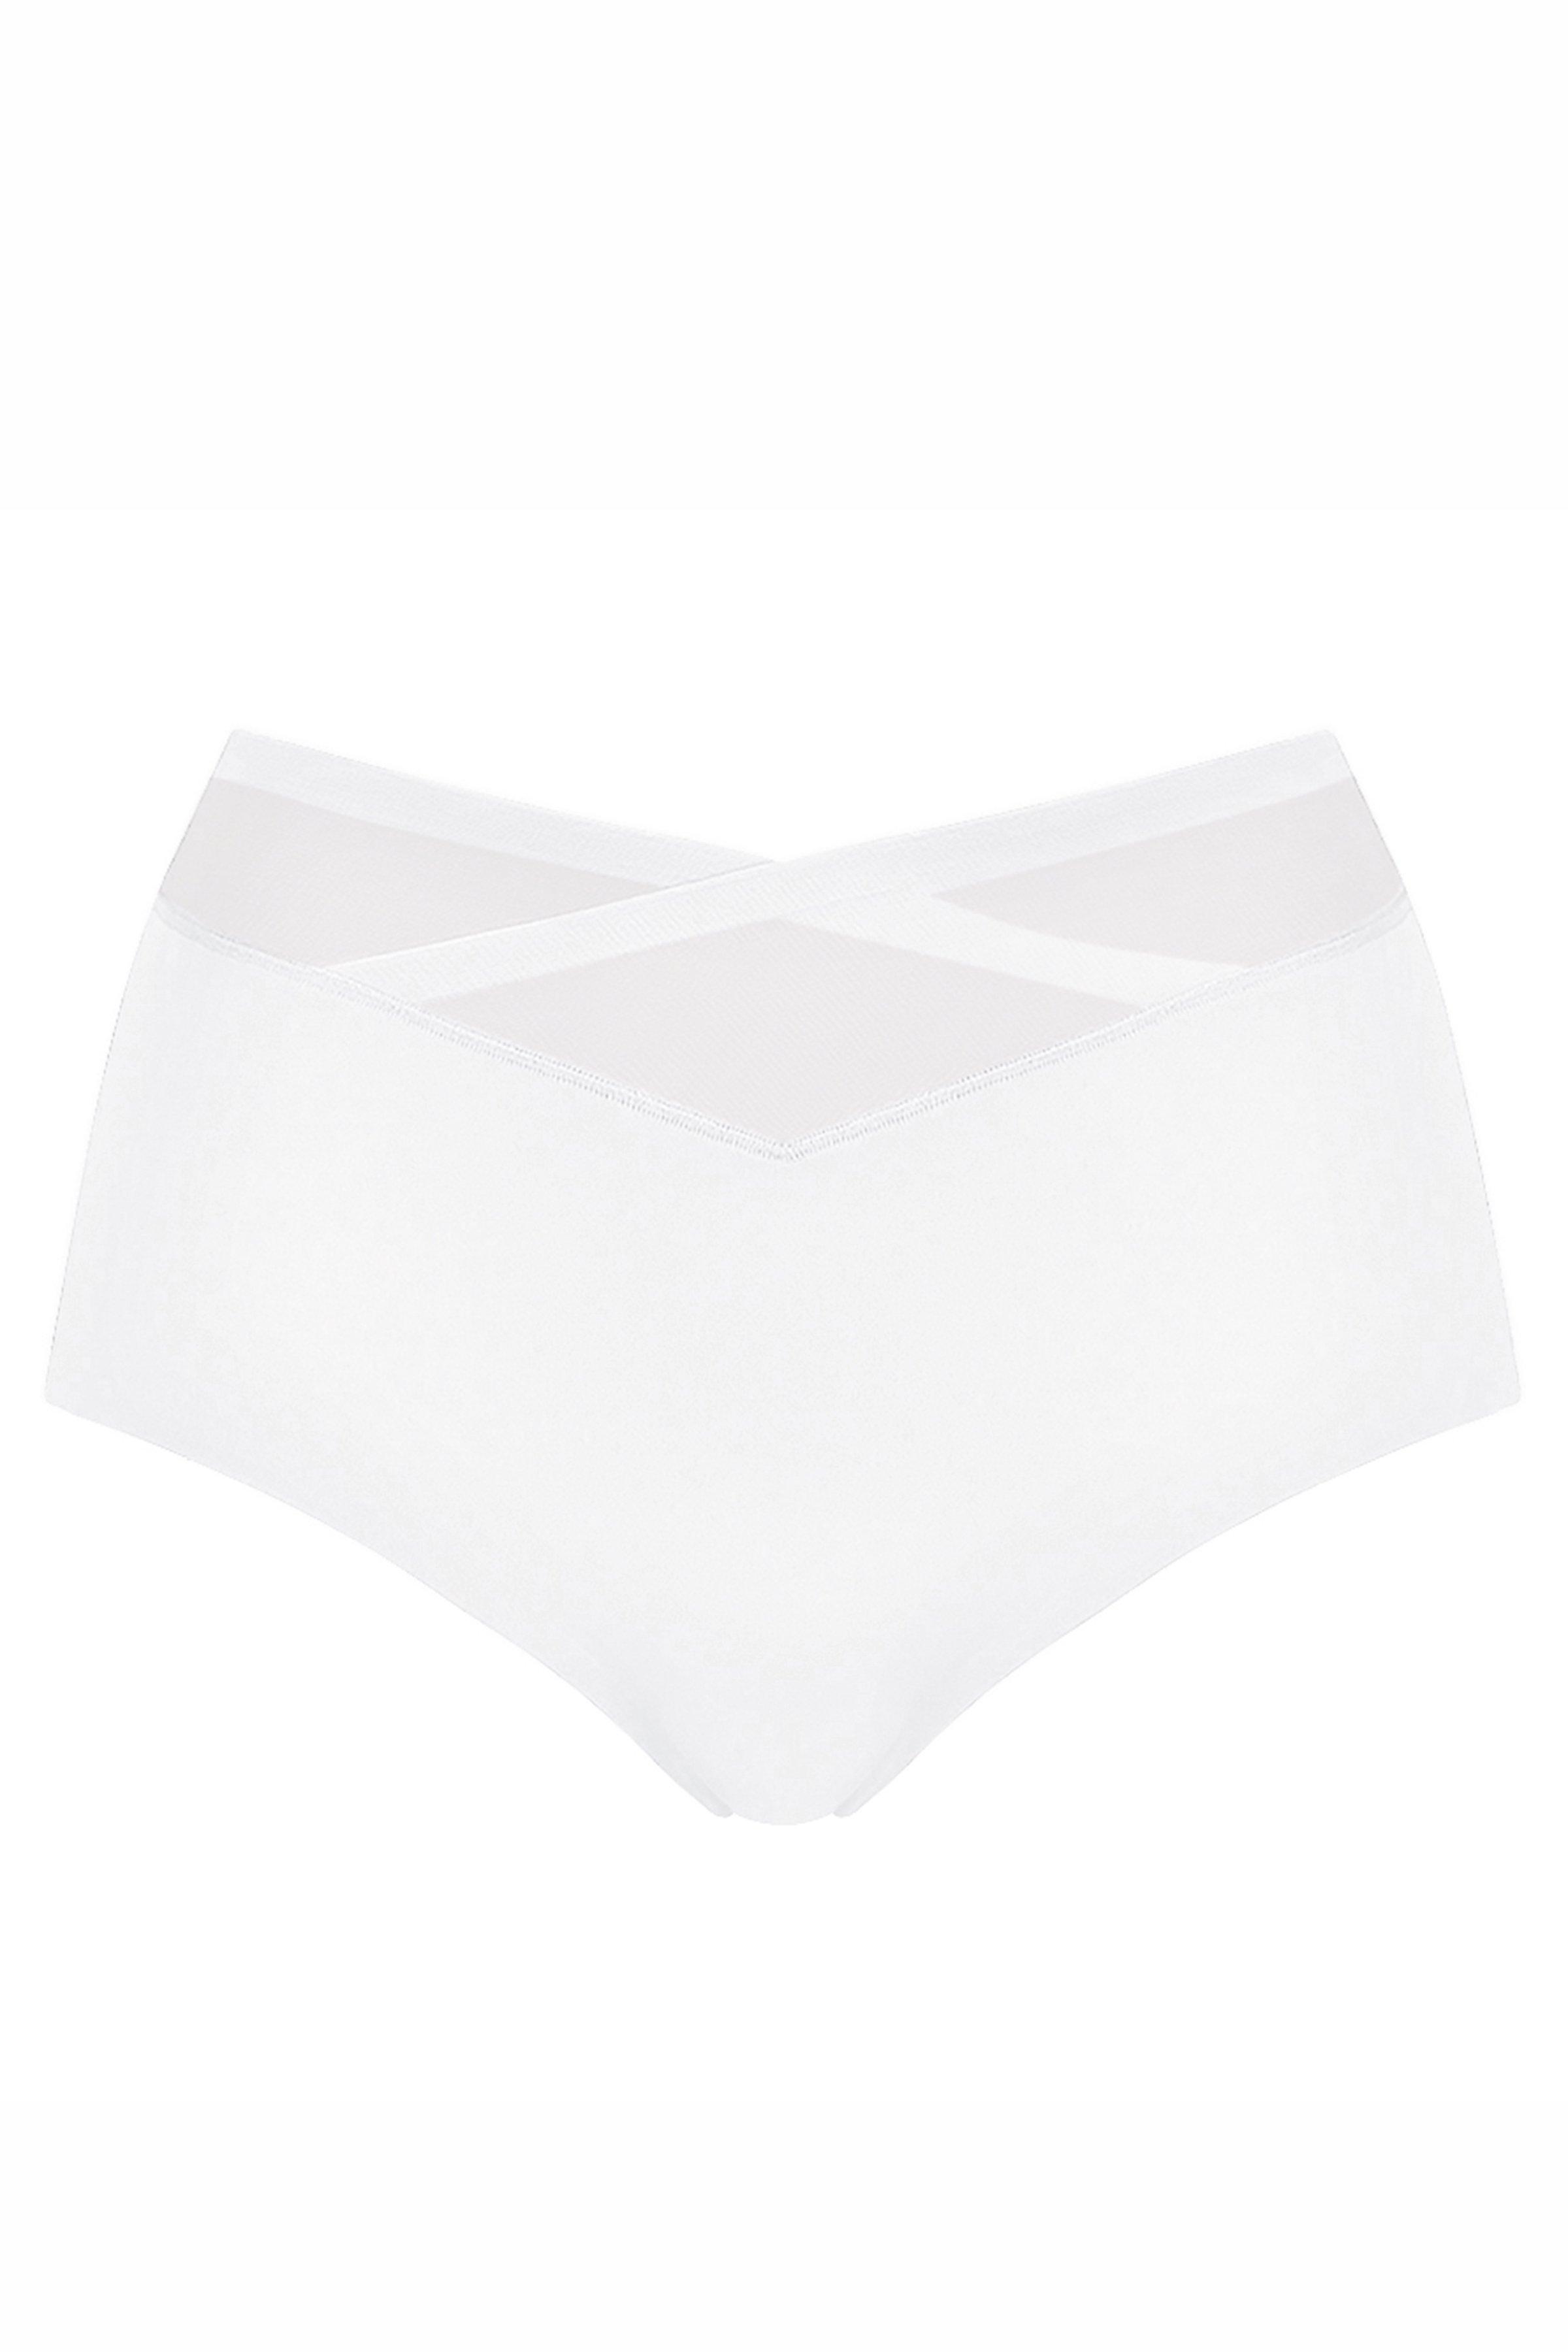 Hvid True Shape Sensation Maxi fra Triumph – Køb Hvid True Shape Sensation Maxi fra str. 38-48 her